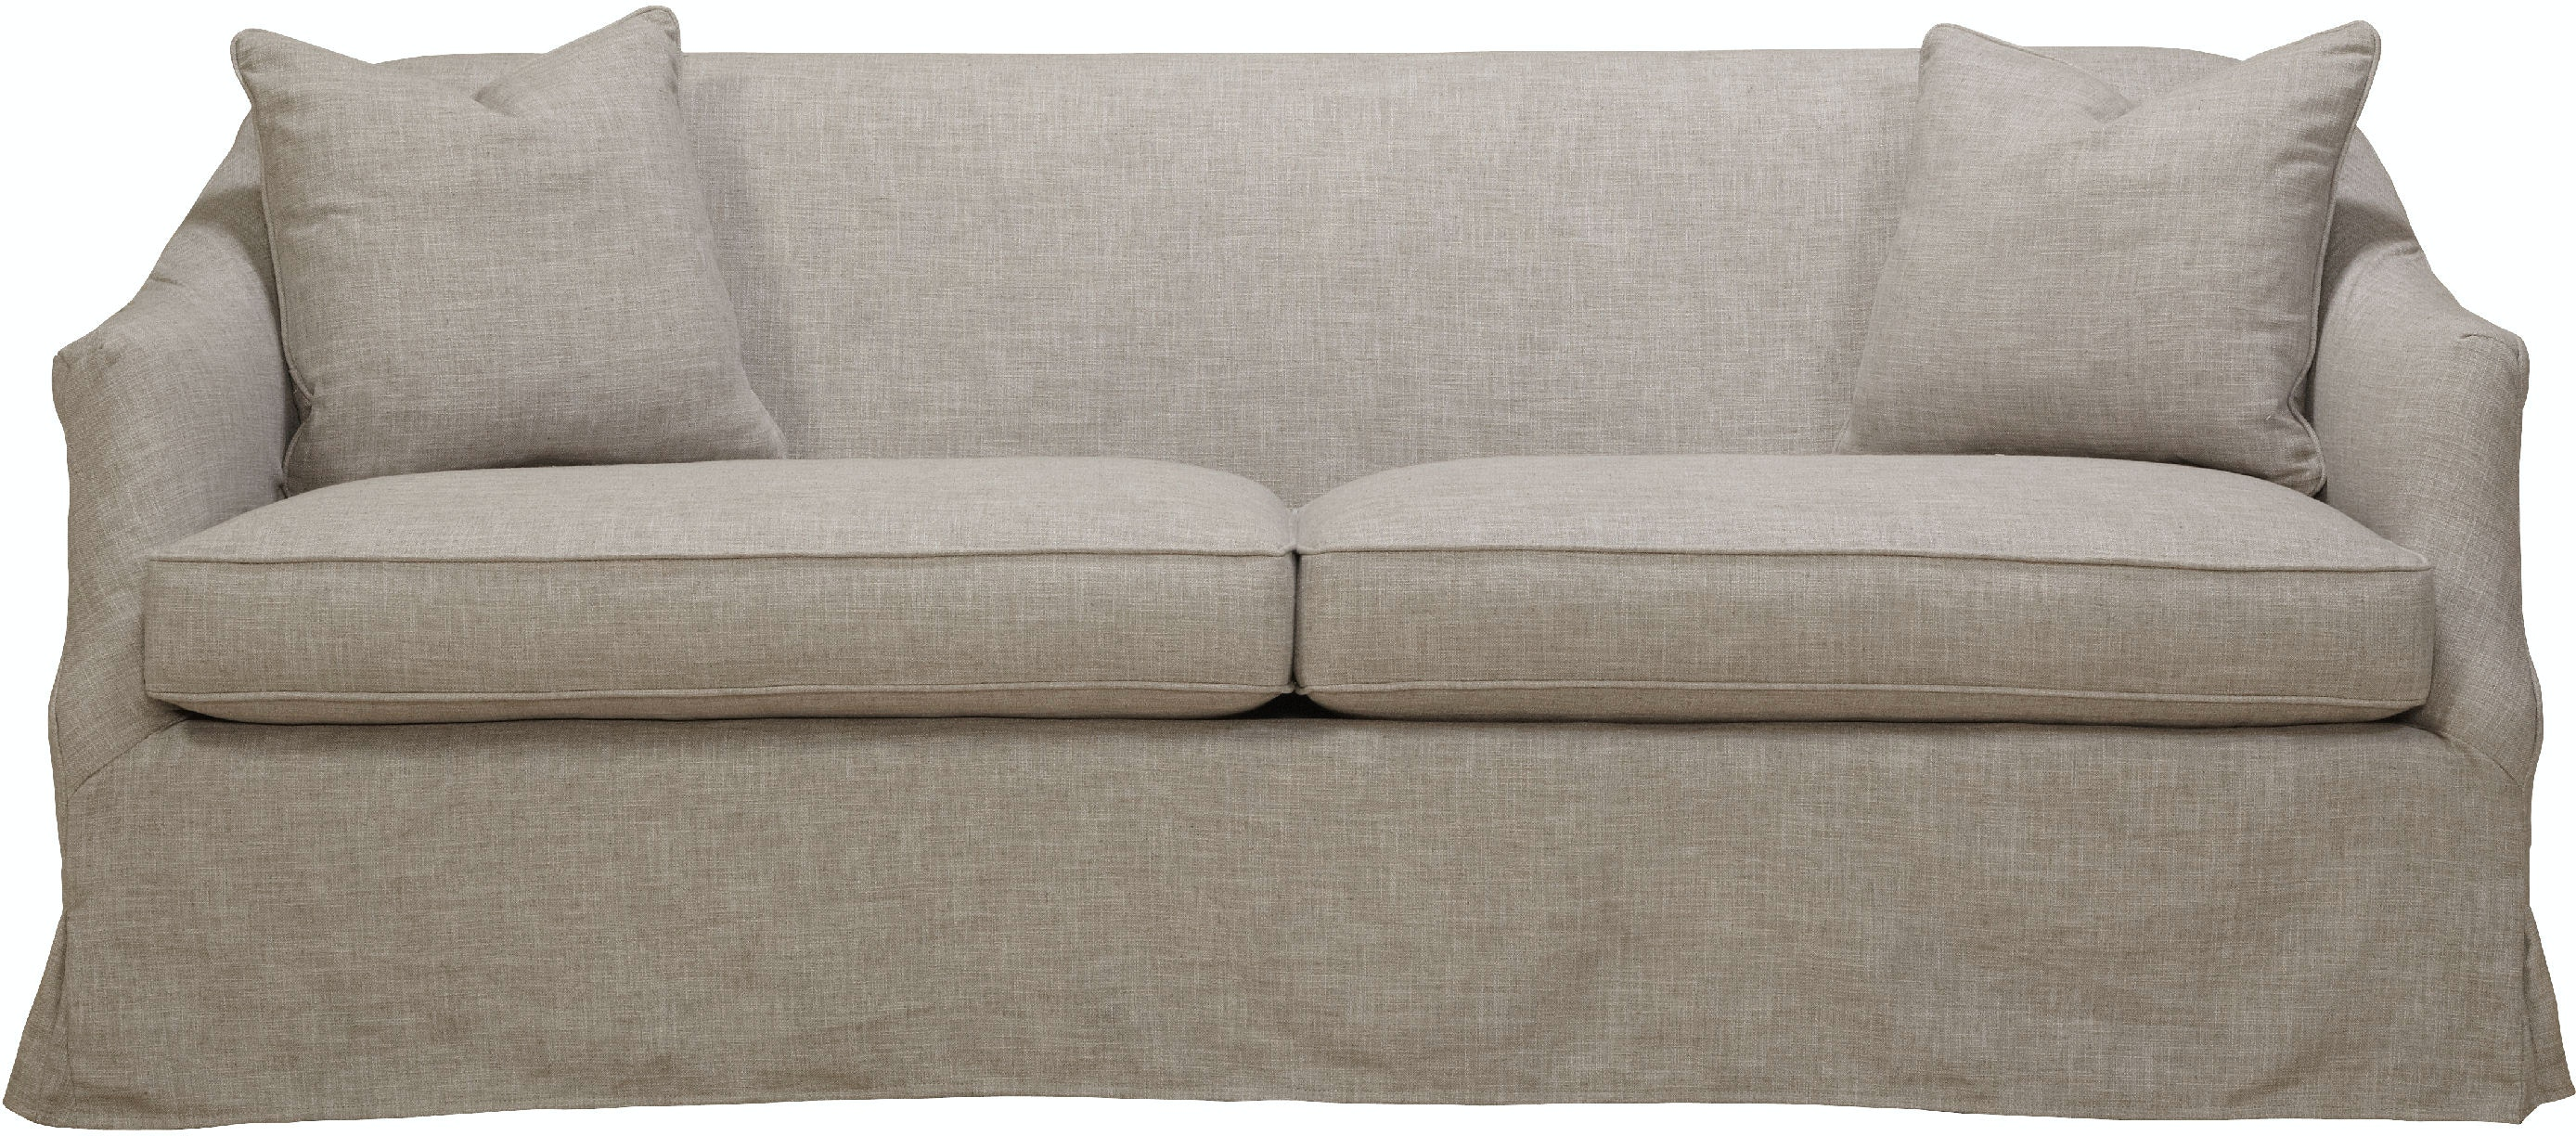 Southern Furniture Living Room Ebie Slipcover Sofa 58261 Giorgi